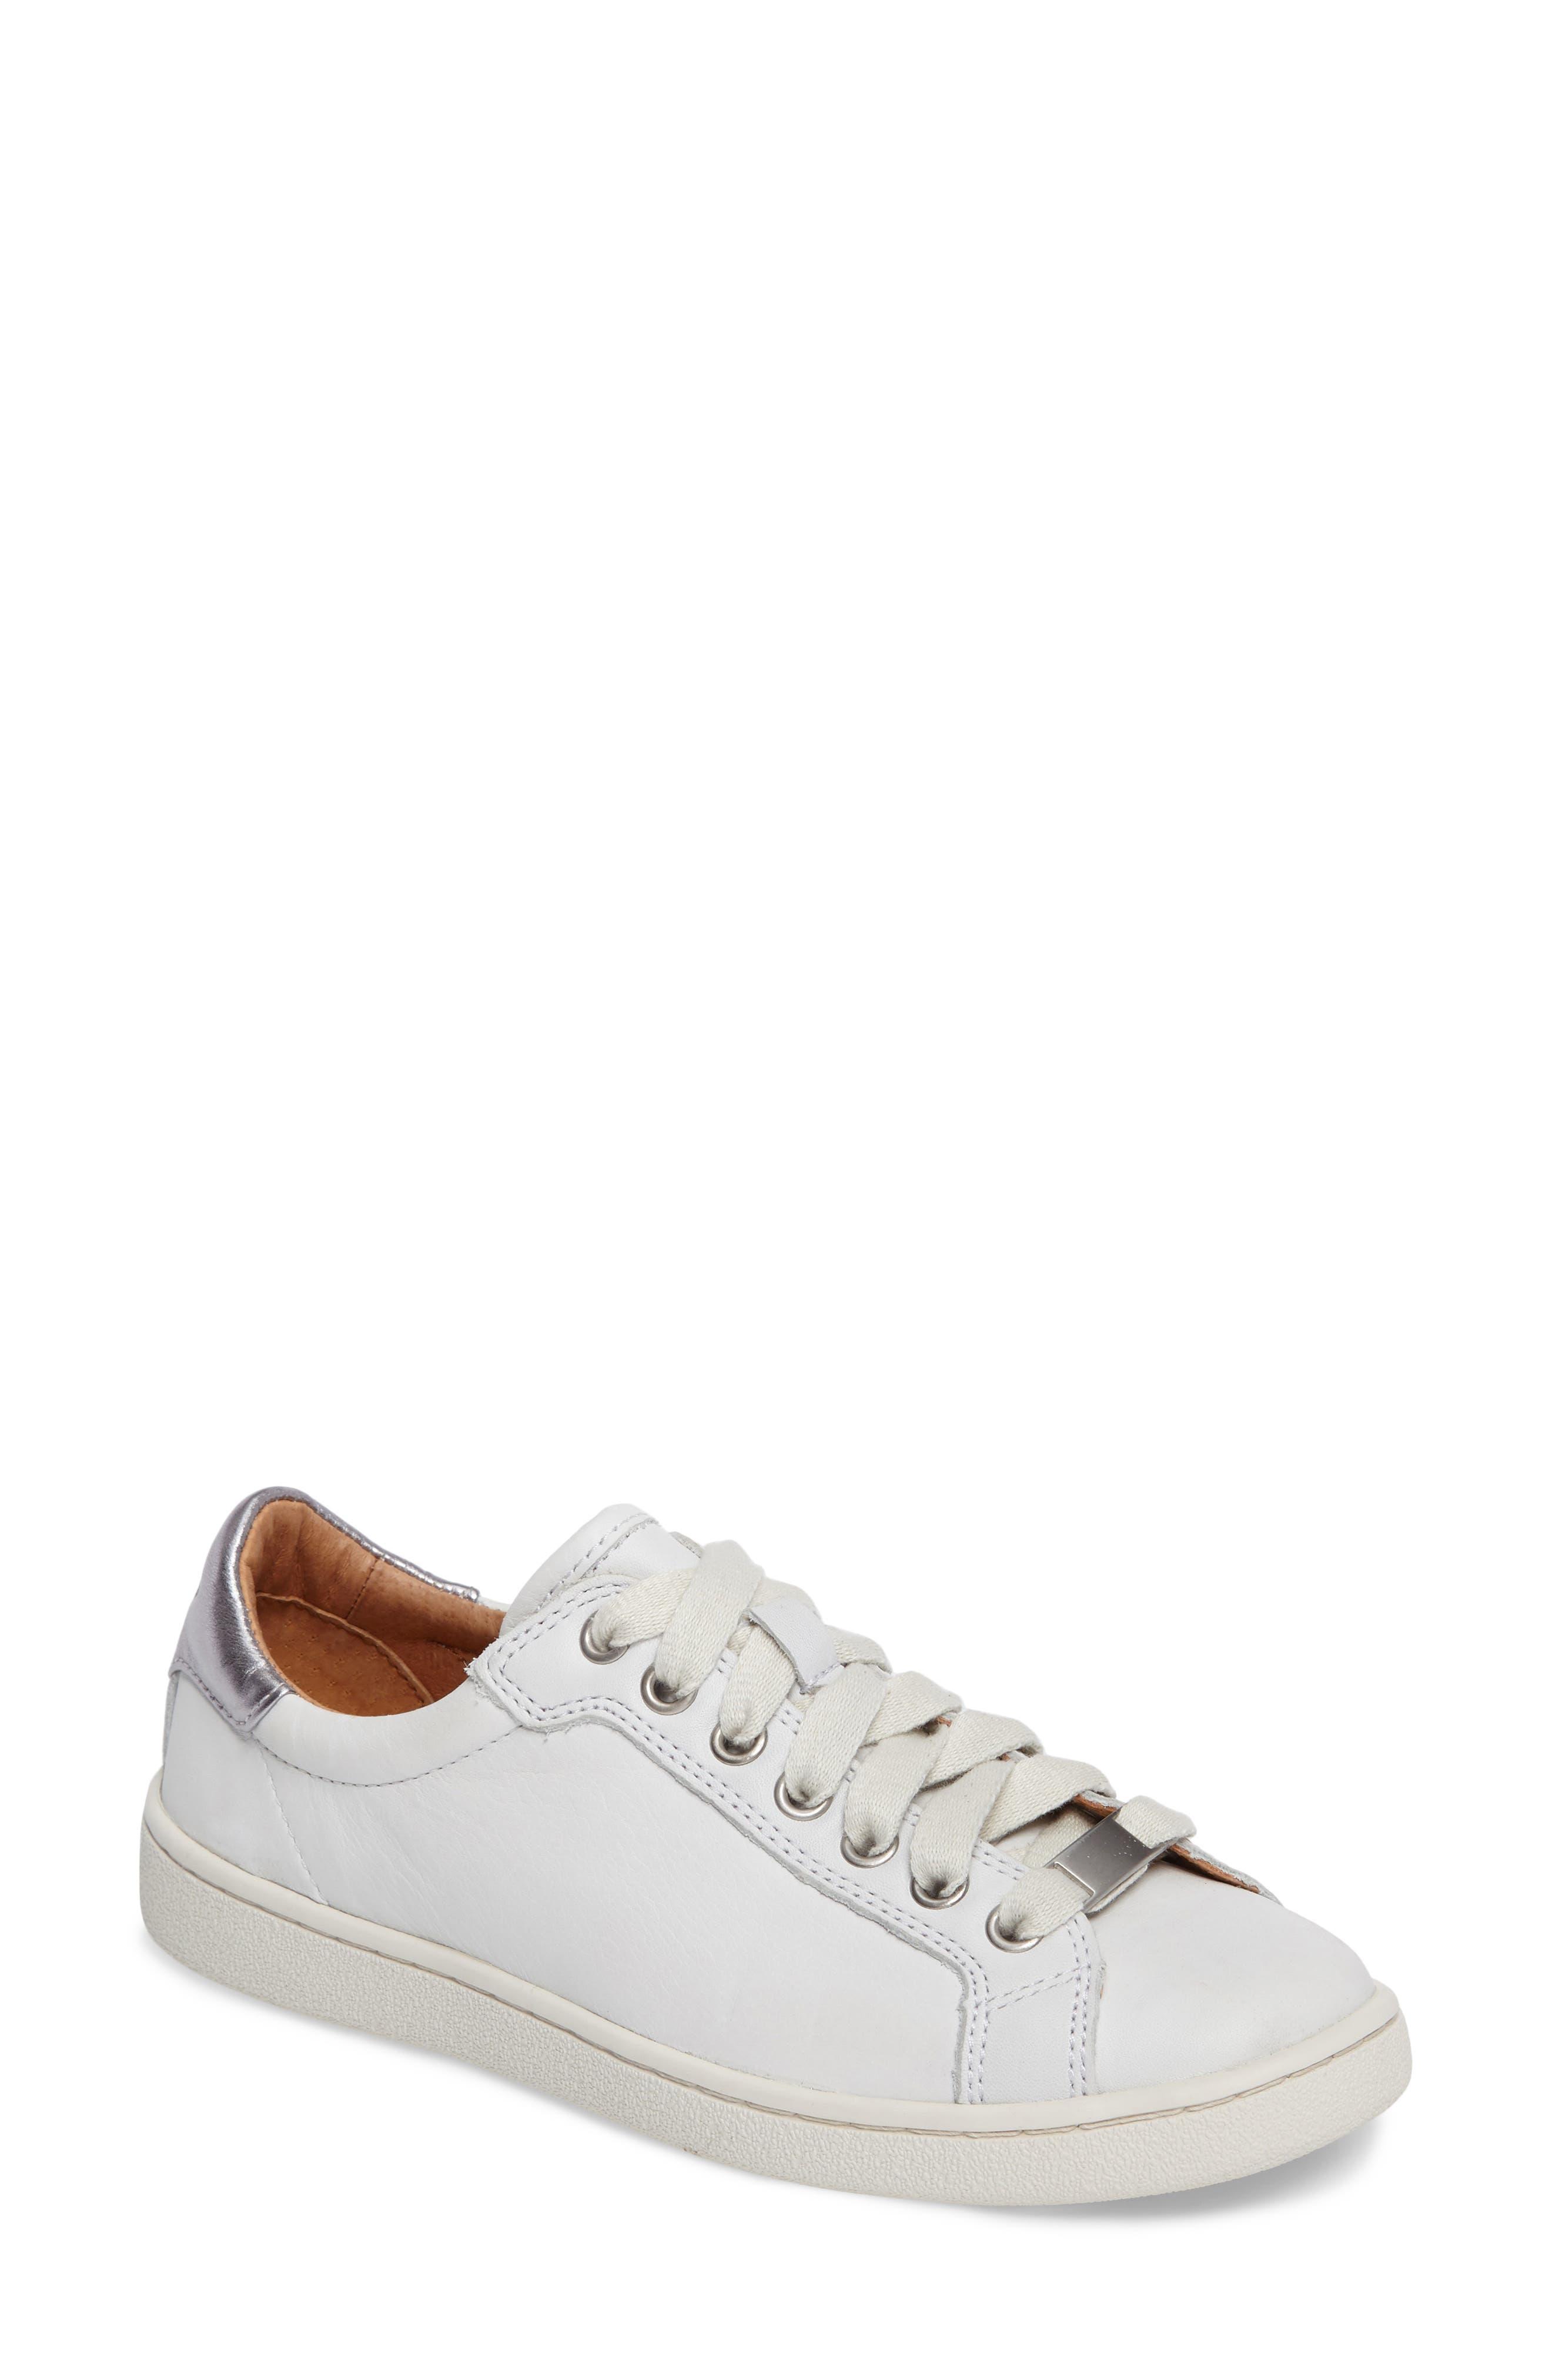 Main Image - UGG® Milo Sneaker (Women)